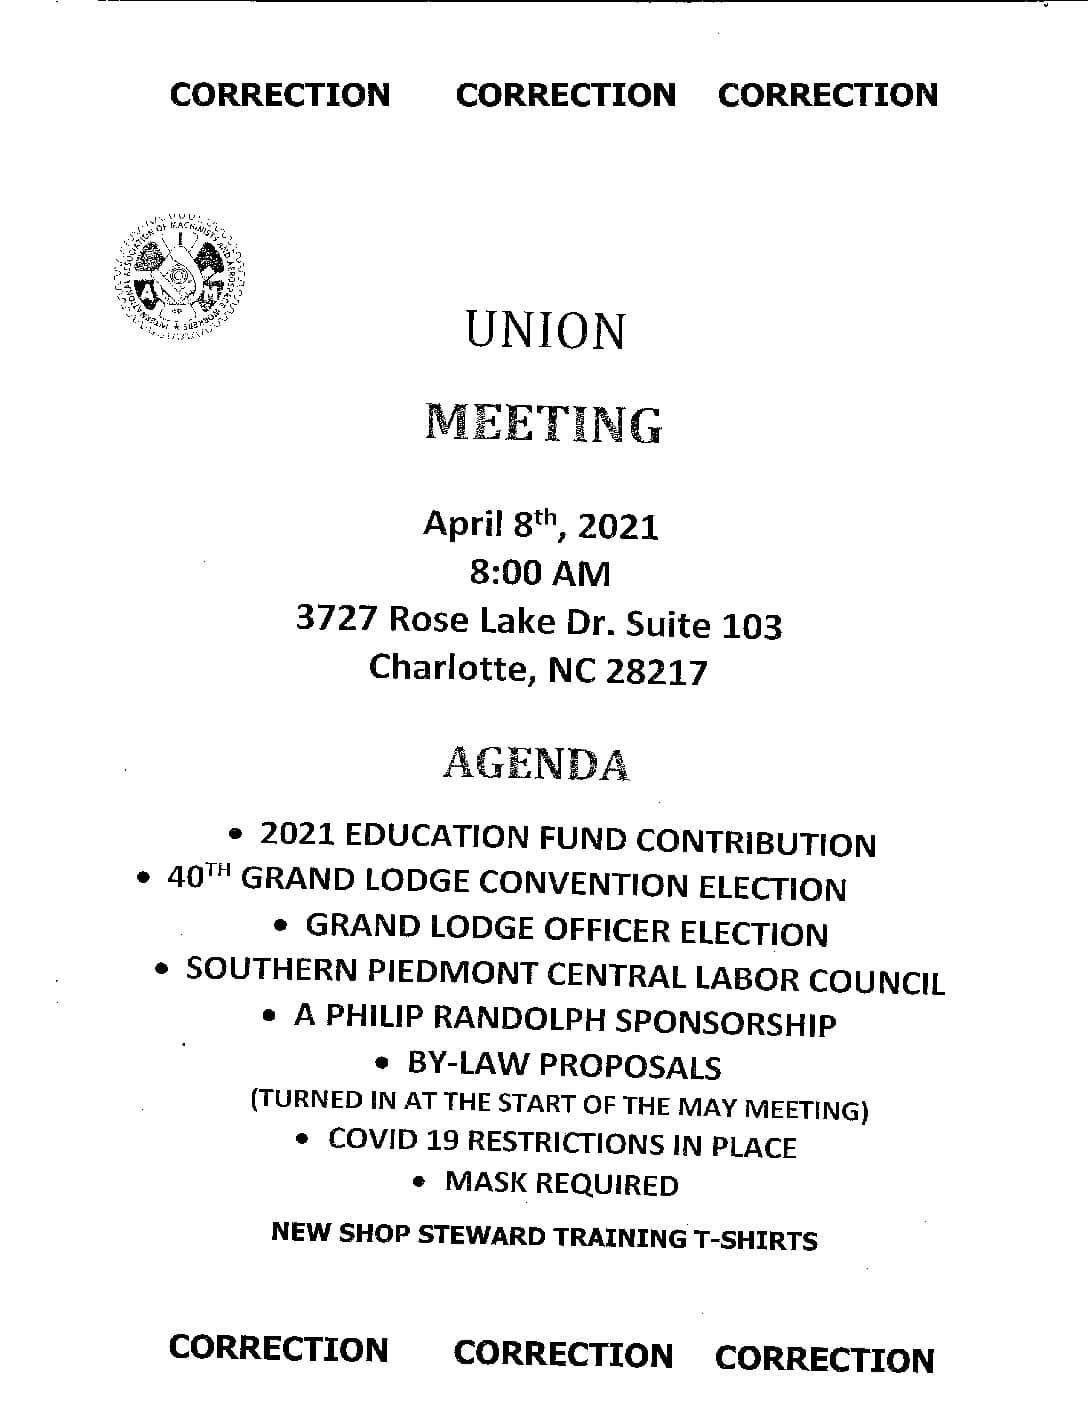 thumbnail of Agenda Apr21 Correction